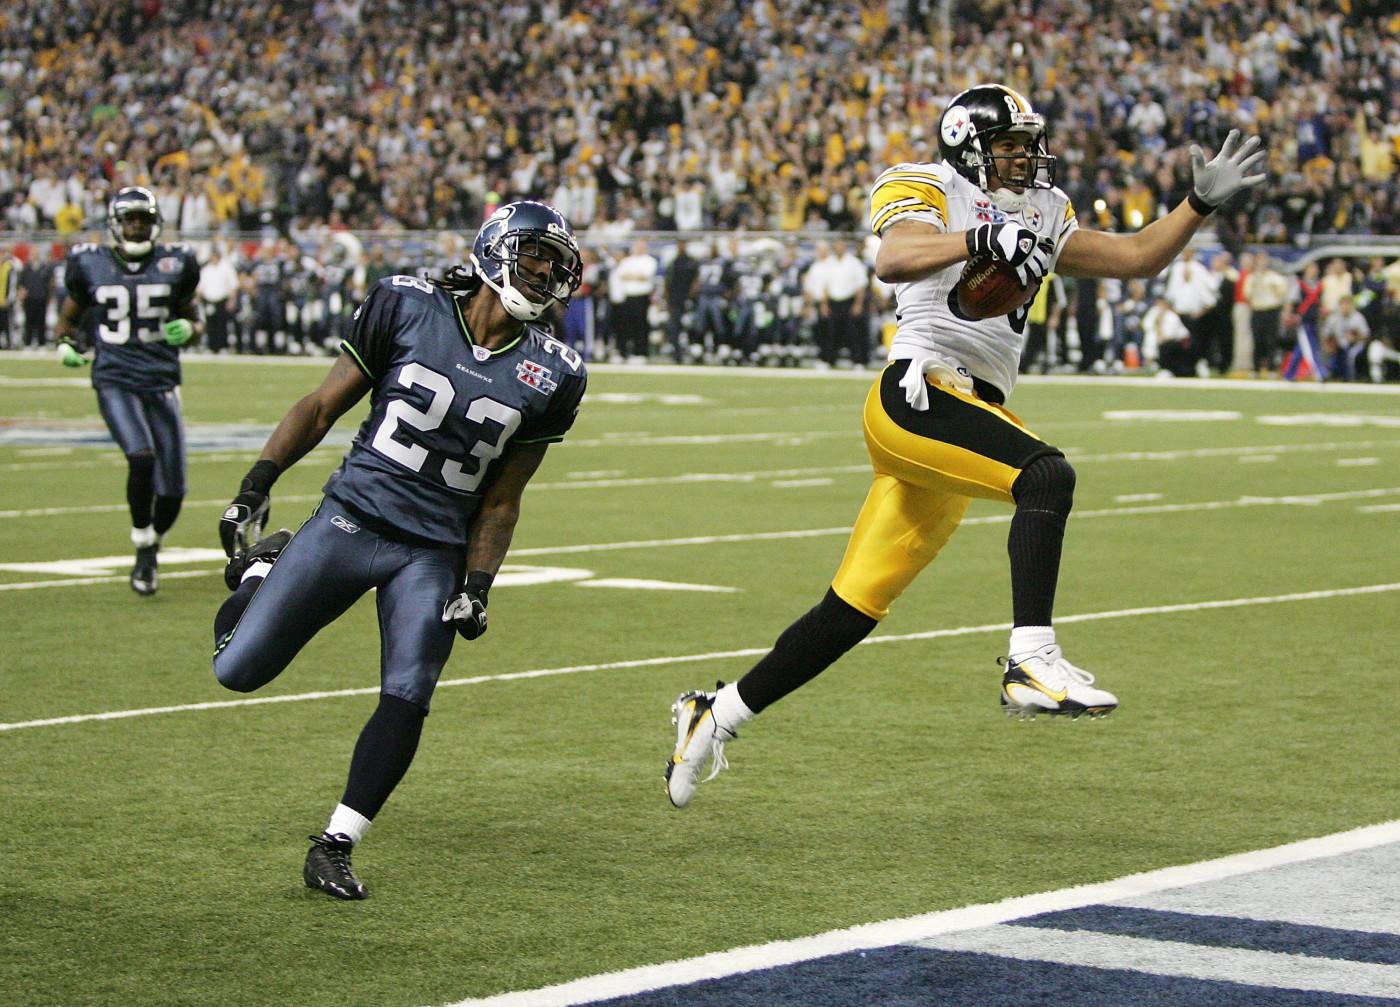 Hines Ward scores a touchdown in Super Bowl XL